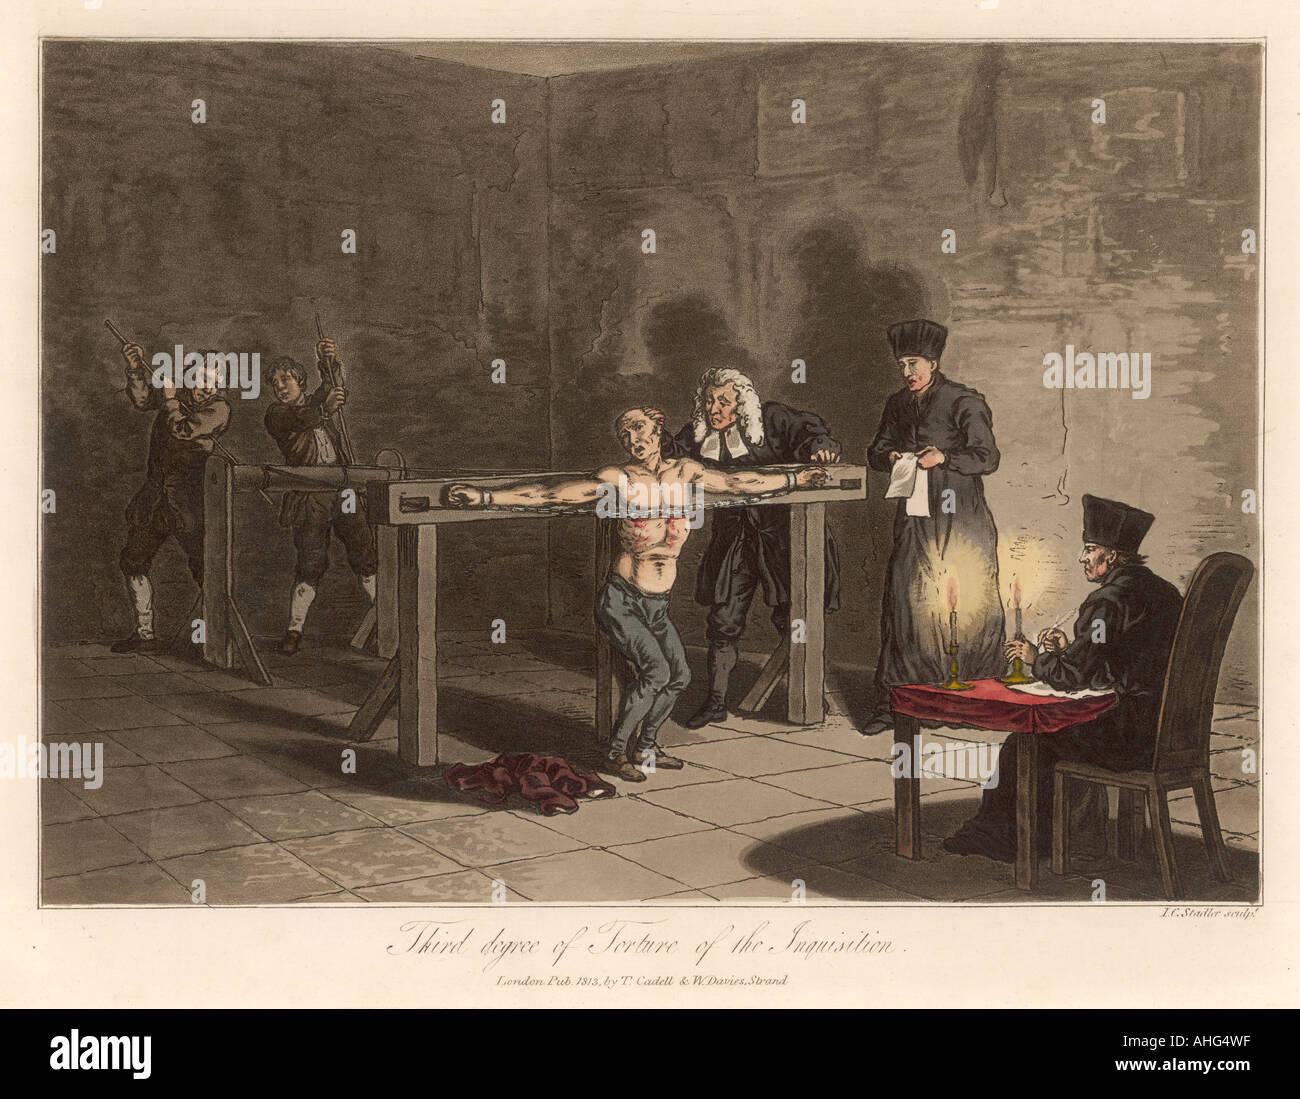 Inquisition Torture 3 - Stock Image